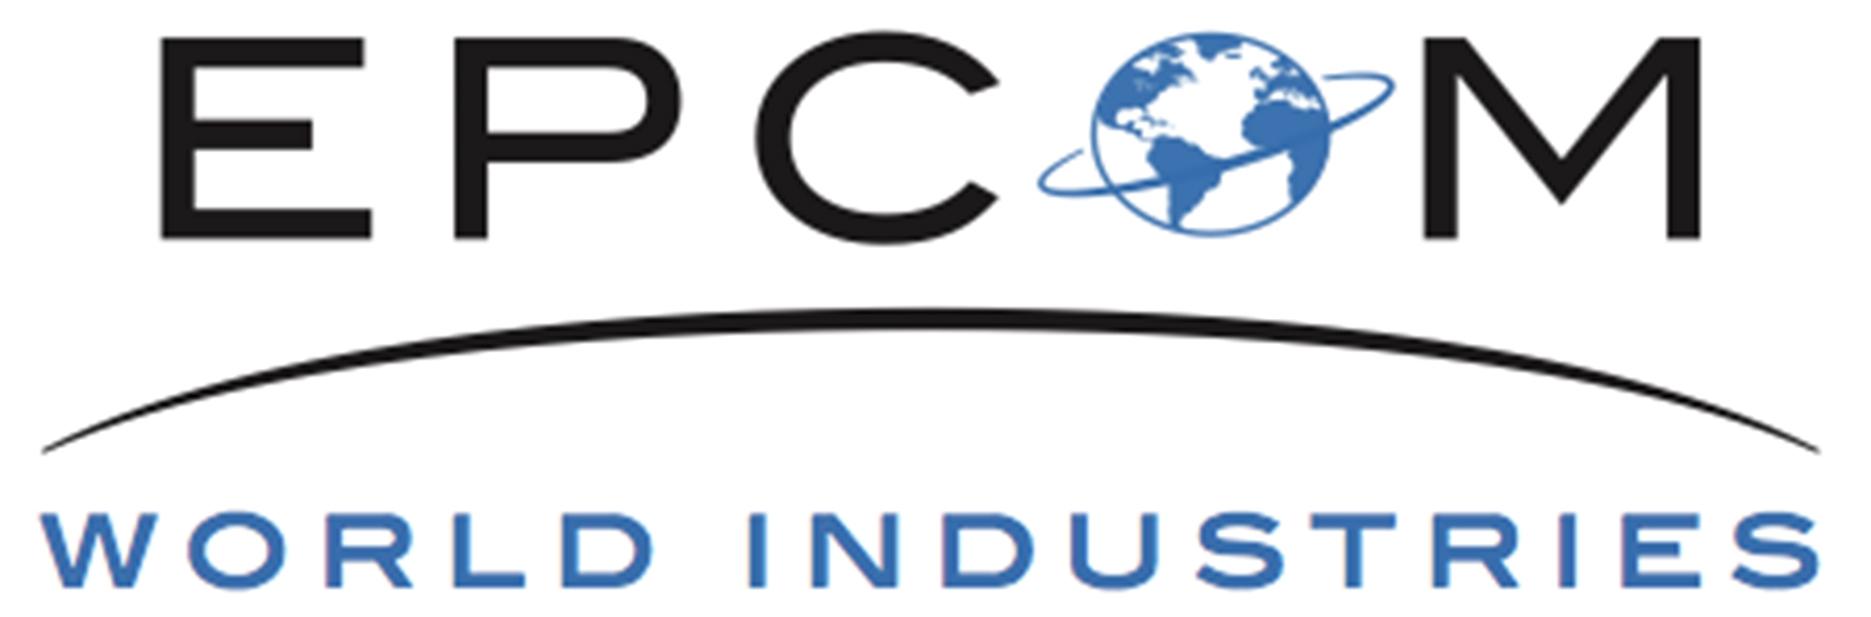 Epcom World Industries